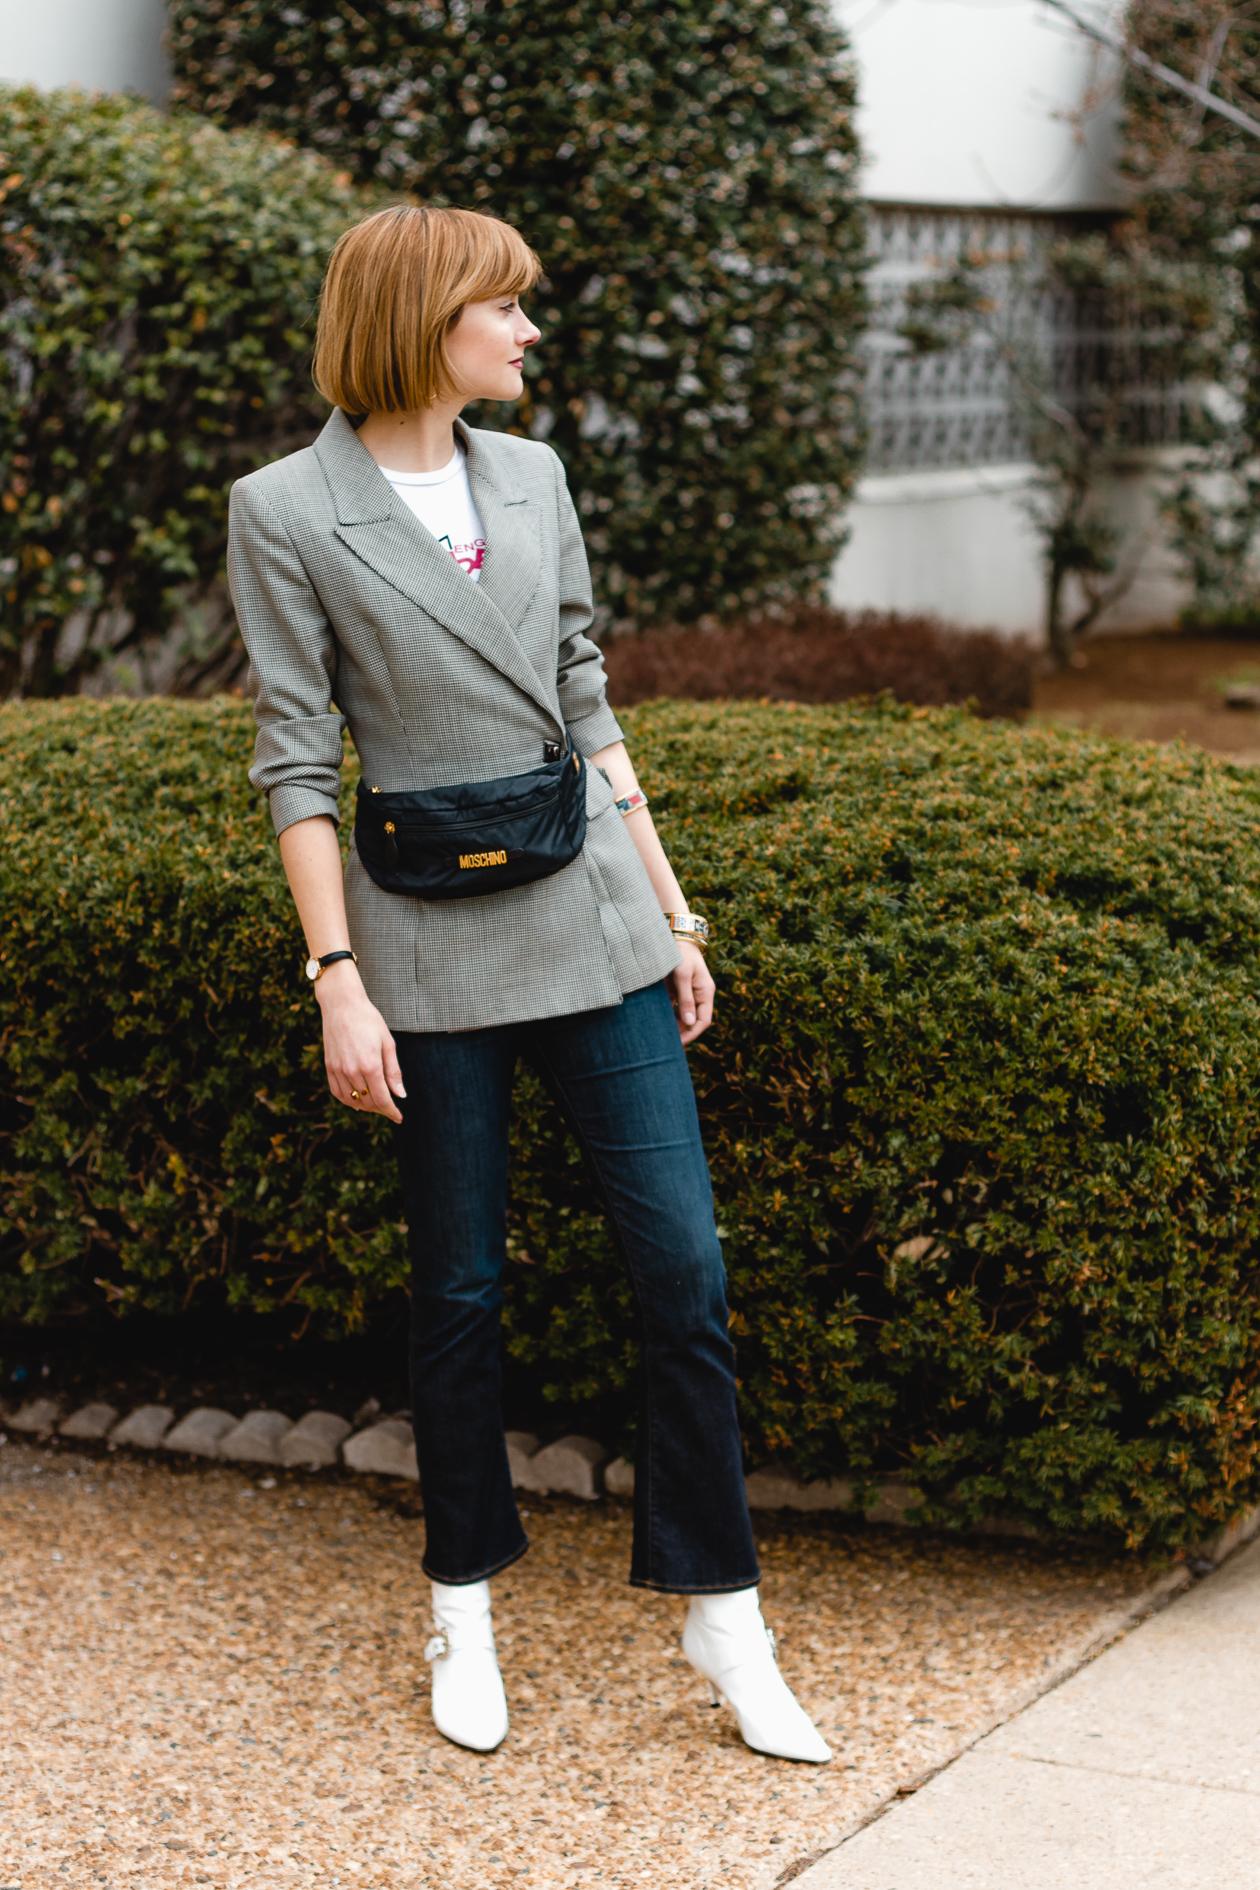 Moschino belt bag and Dorasteymur boots